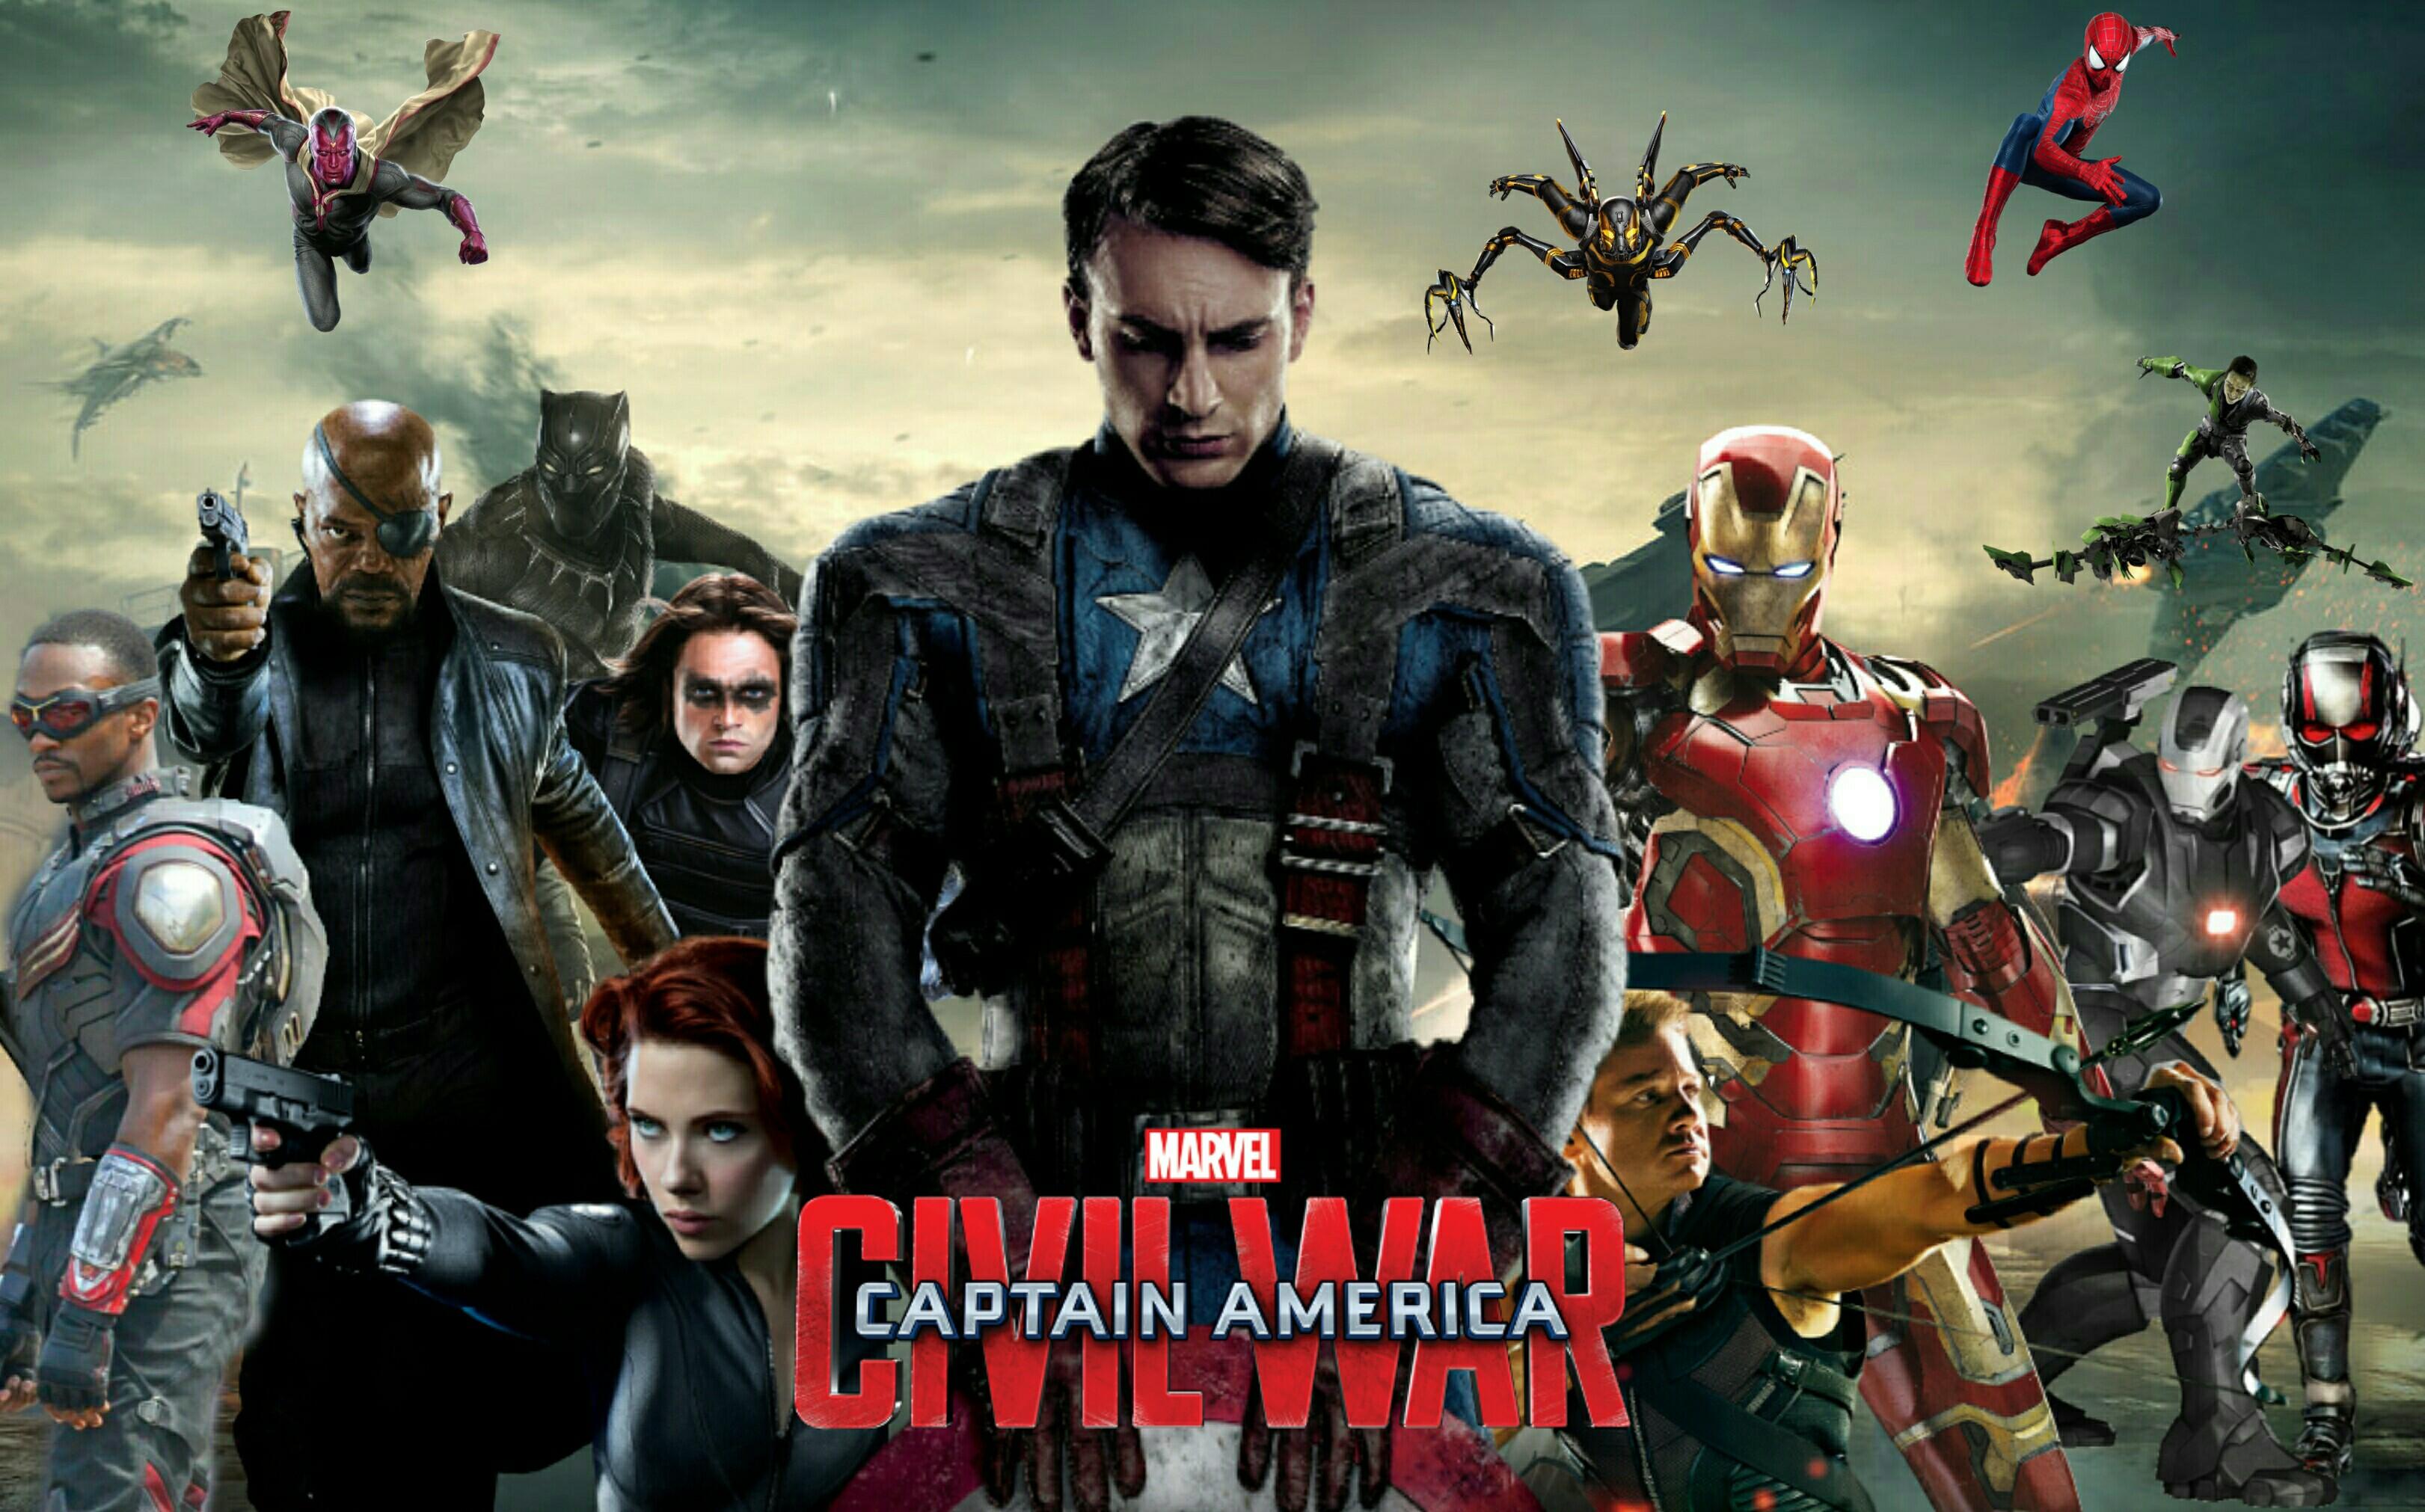 Captain America Civil War Wallpaper Amazing Images 3242x2022